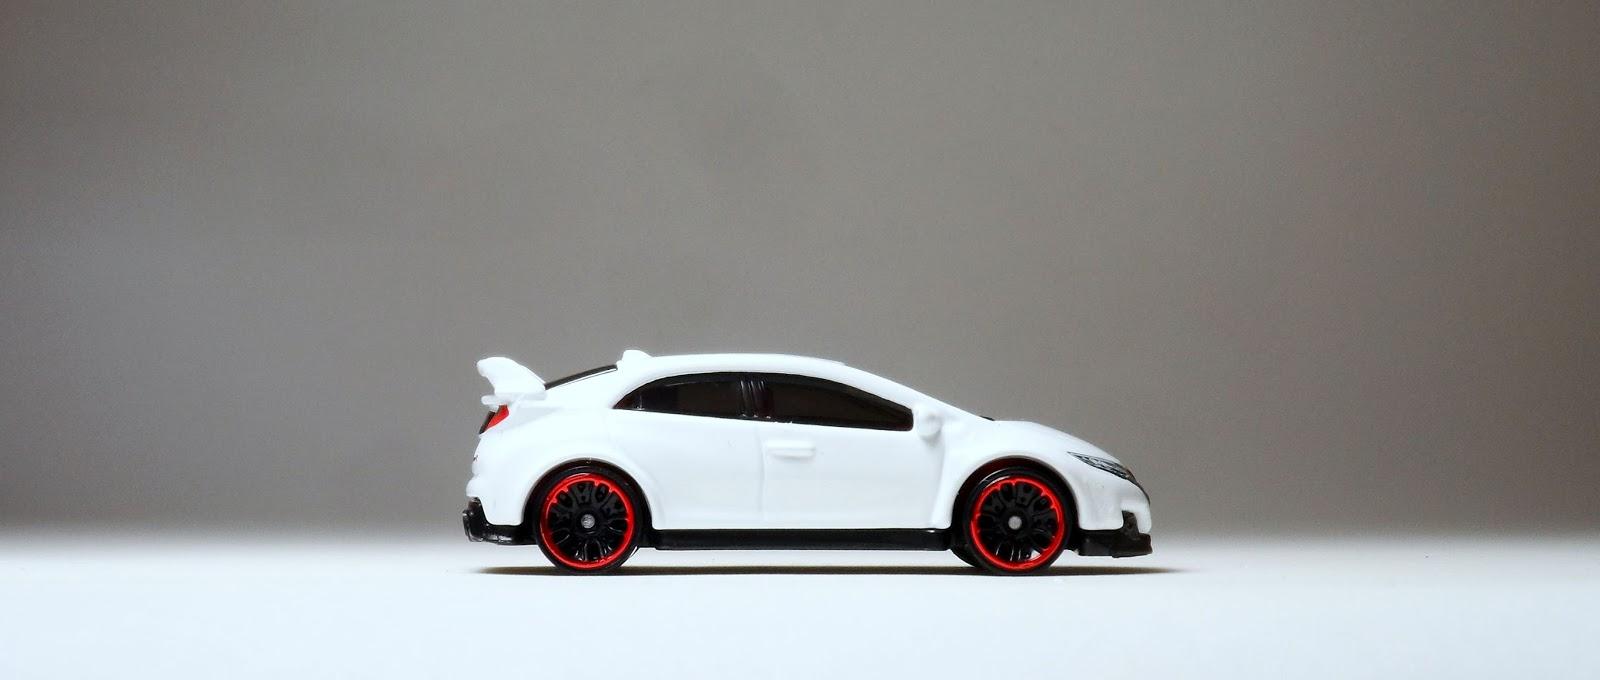 honda civic hot wheels  | minisinfoco.blogspot.com